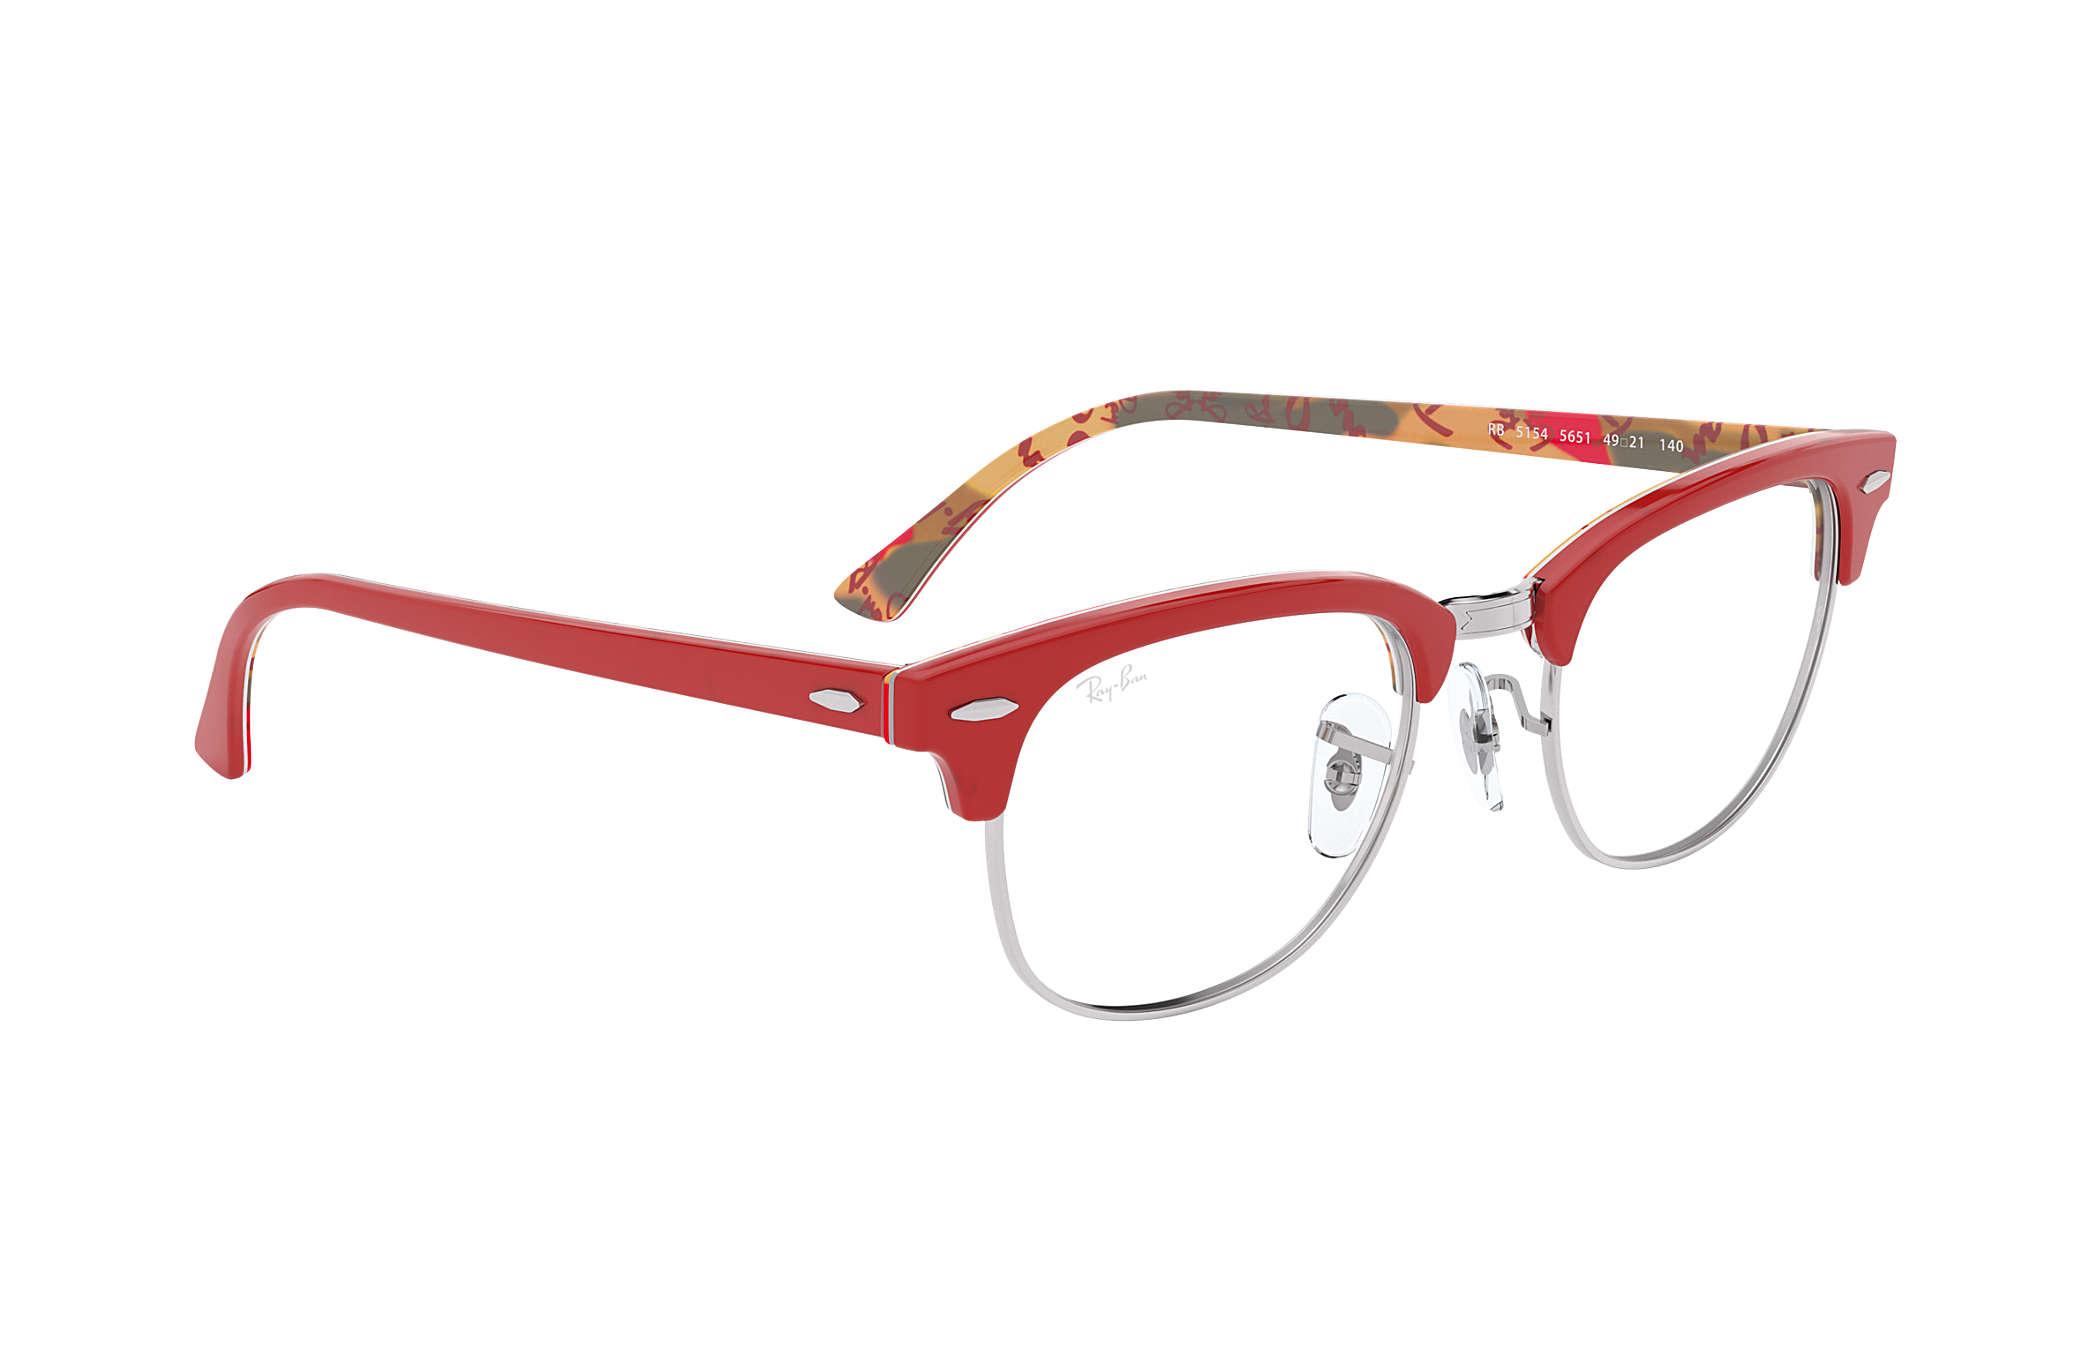 261911582bf Ray-Ban eyeglasses Clubmaster Optics RB5154 Red - Acetate ...